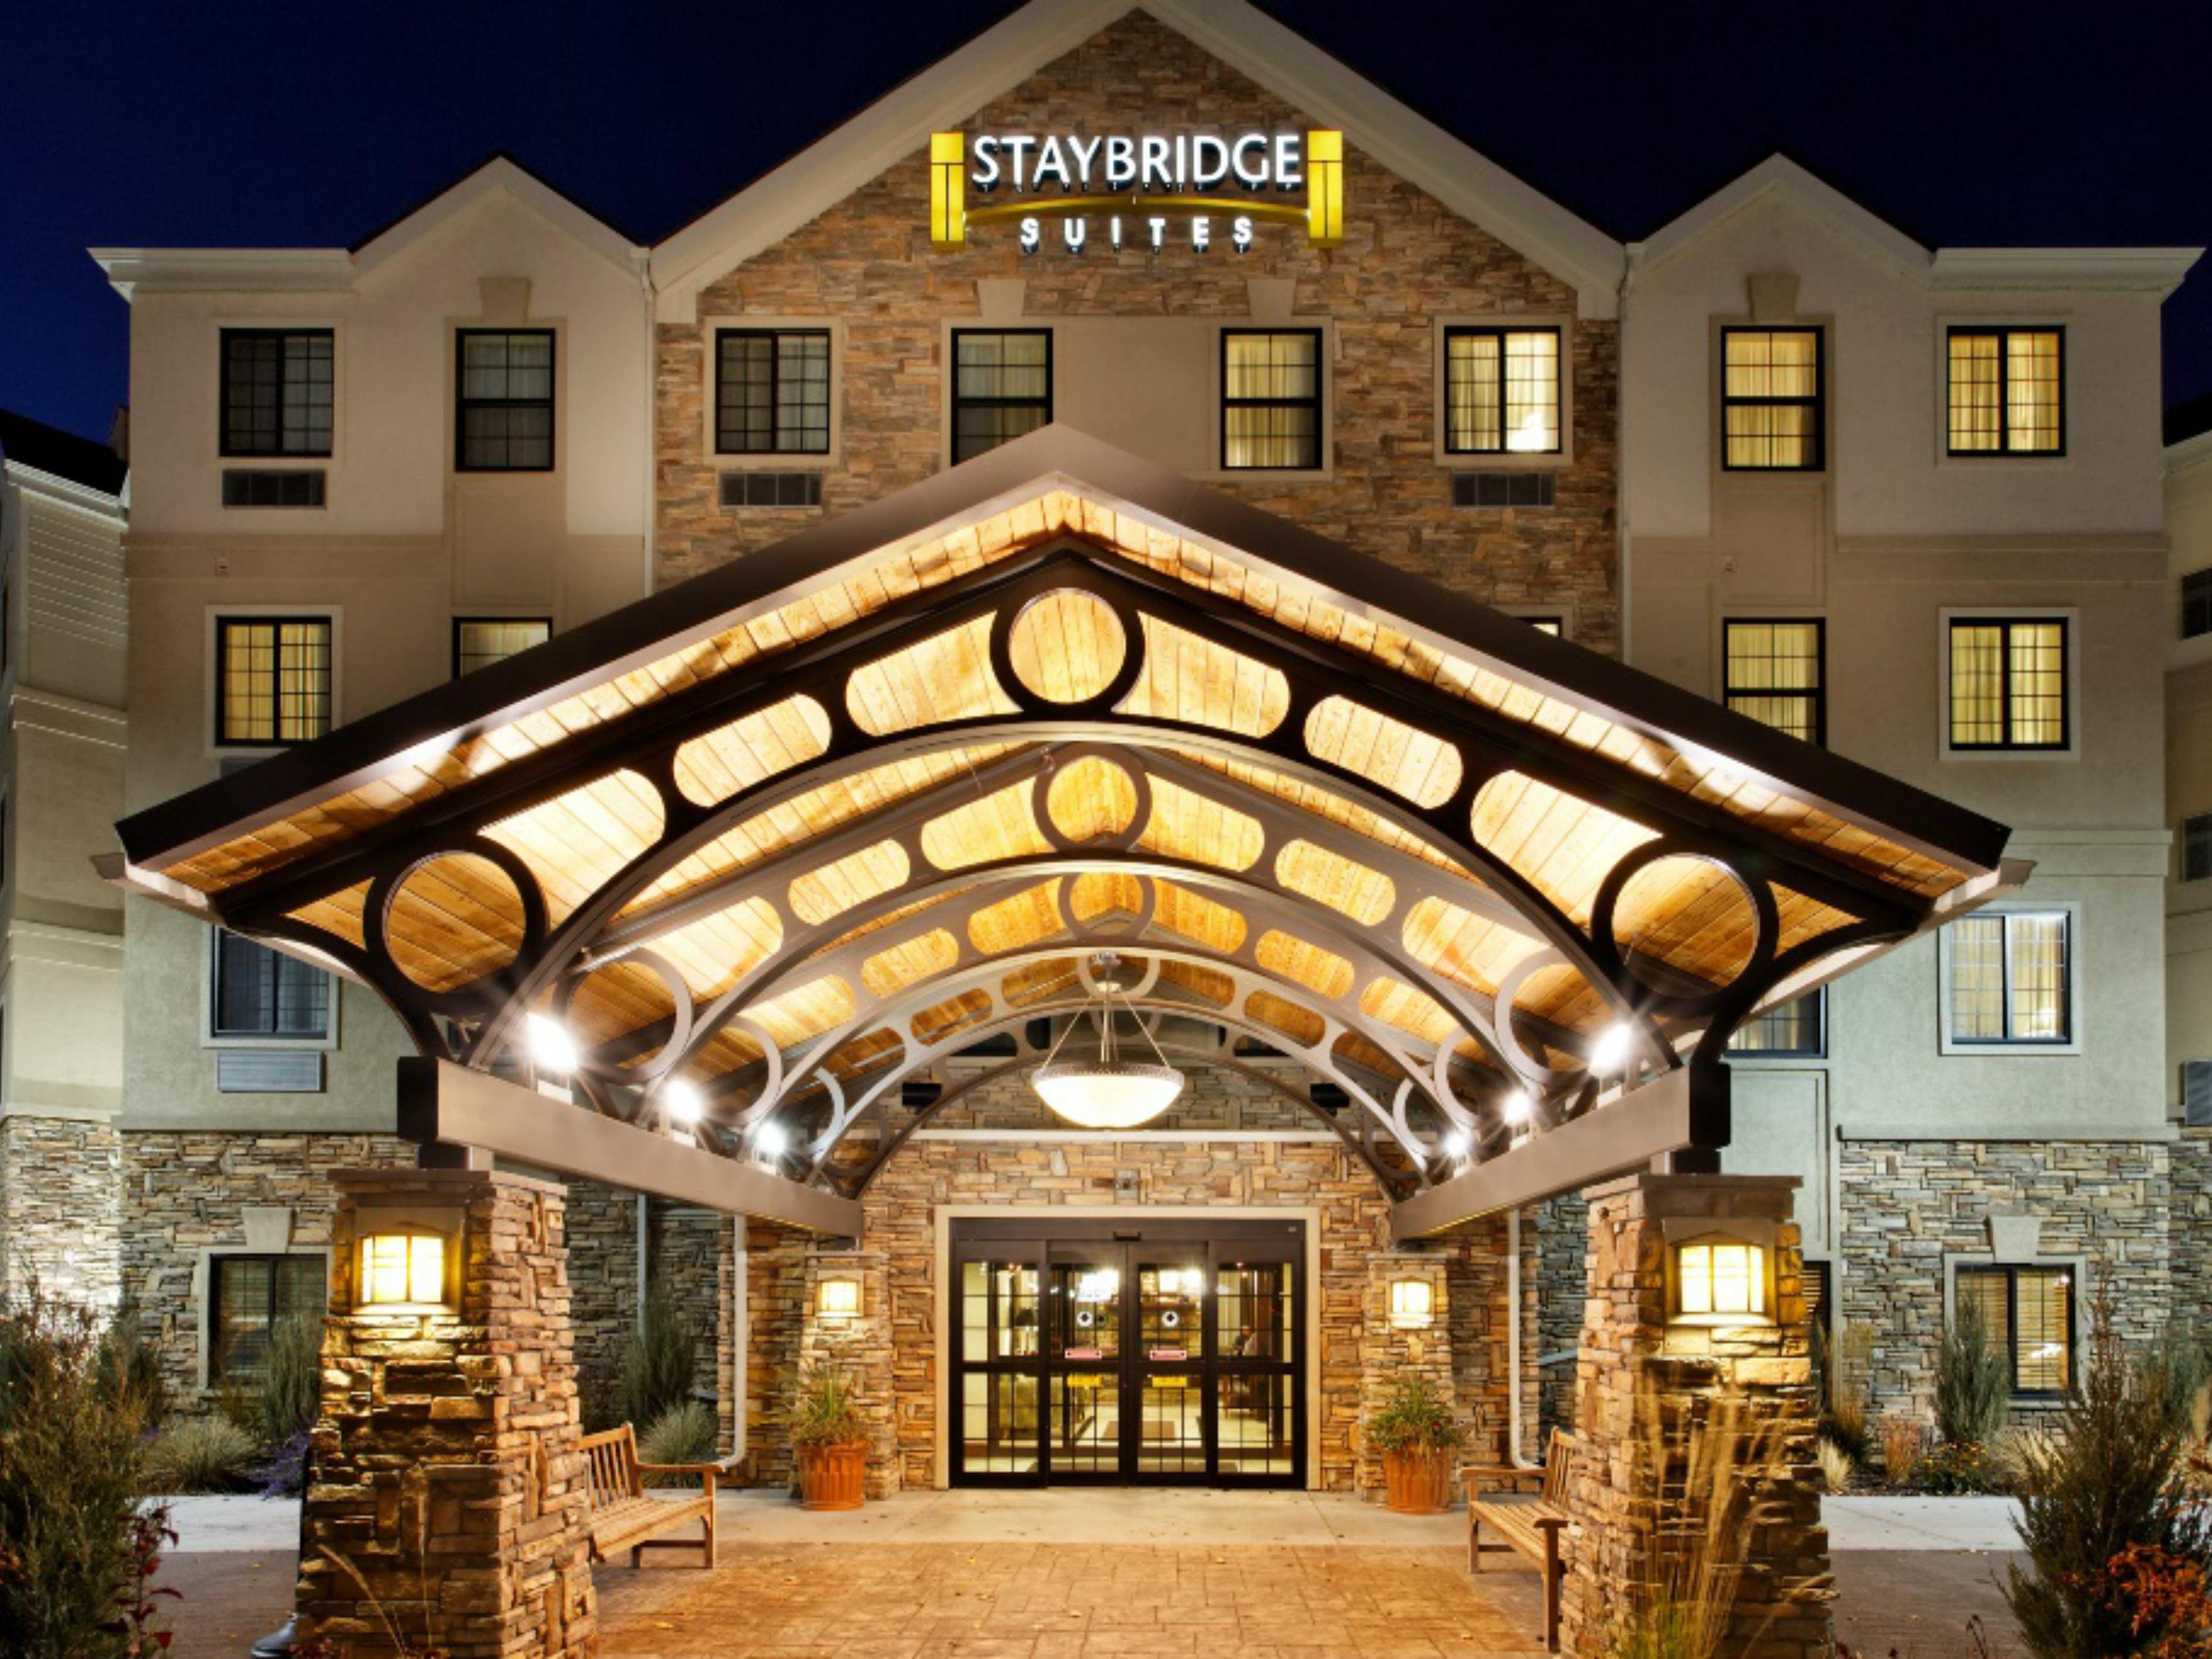 Staybridge Suites Auburn Hills In Michigan